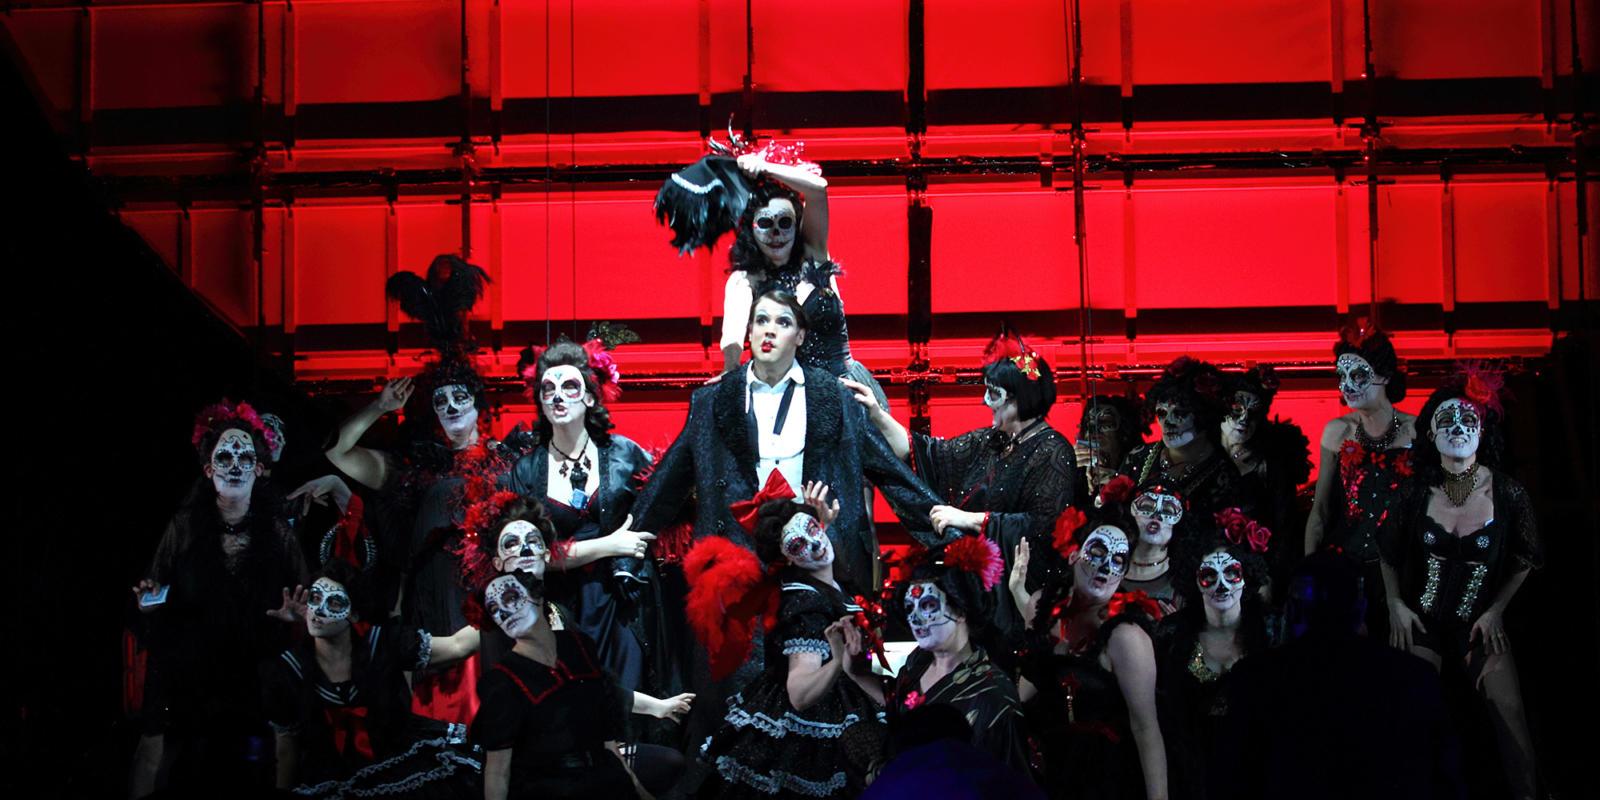 Bozidar Smiljanic as the Marquis in the 2017/18 season production of Verdi's La traviata